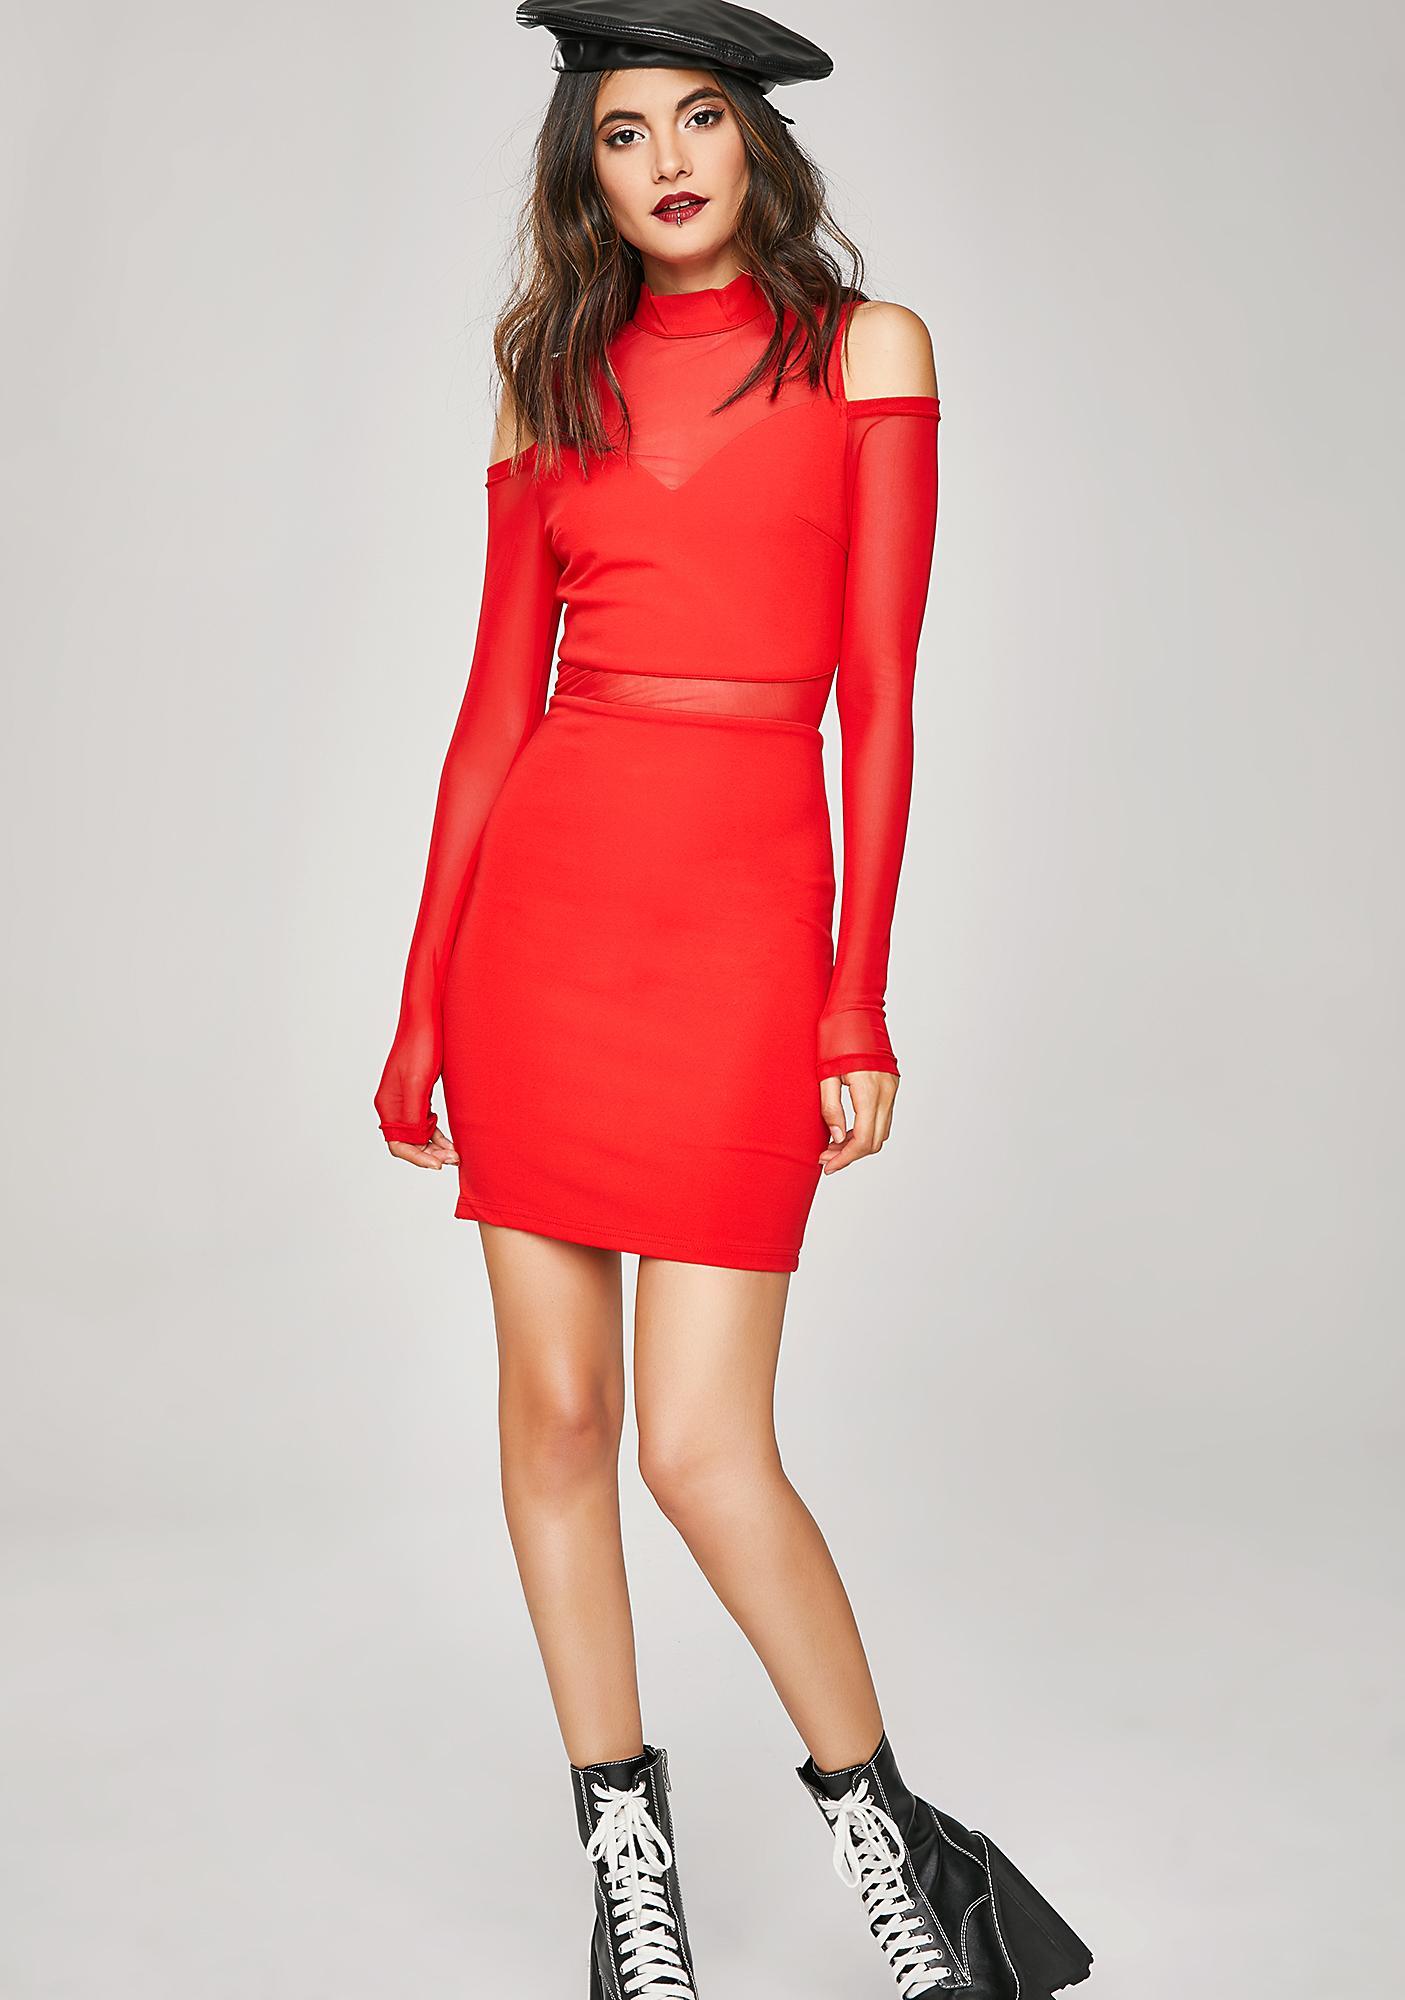 Life Changer Mini Dress